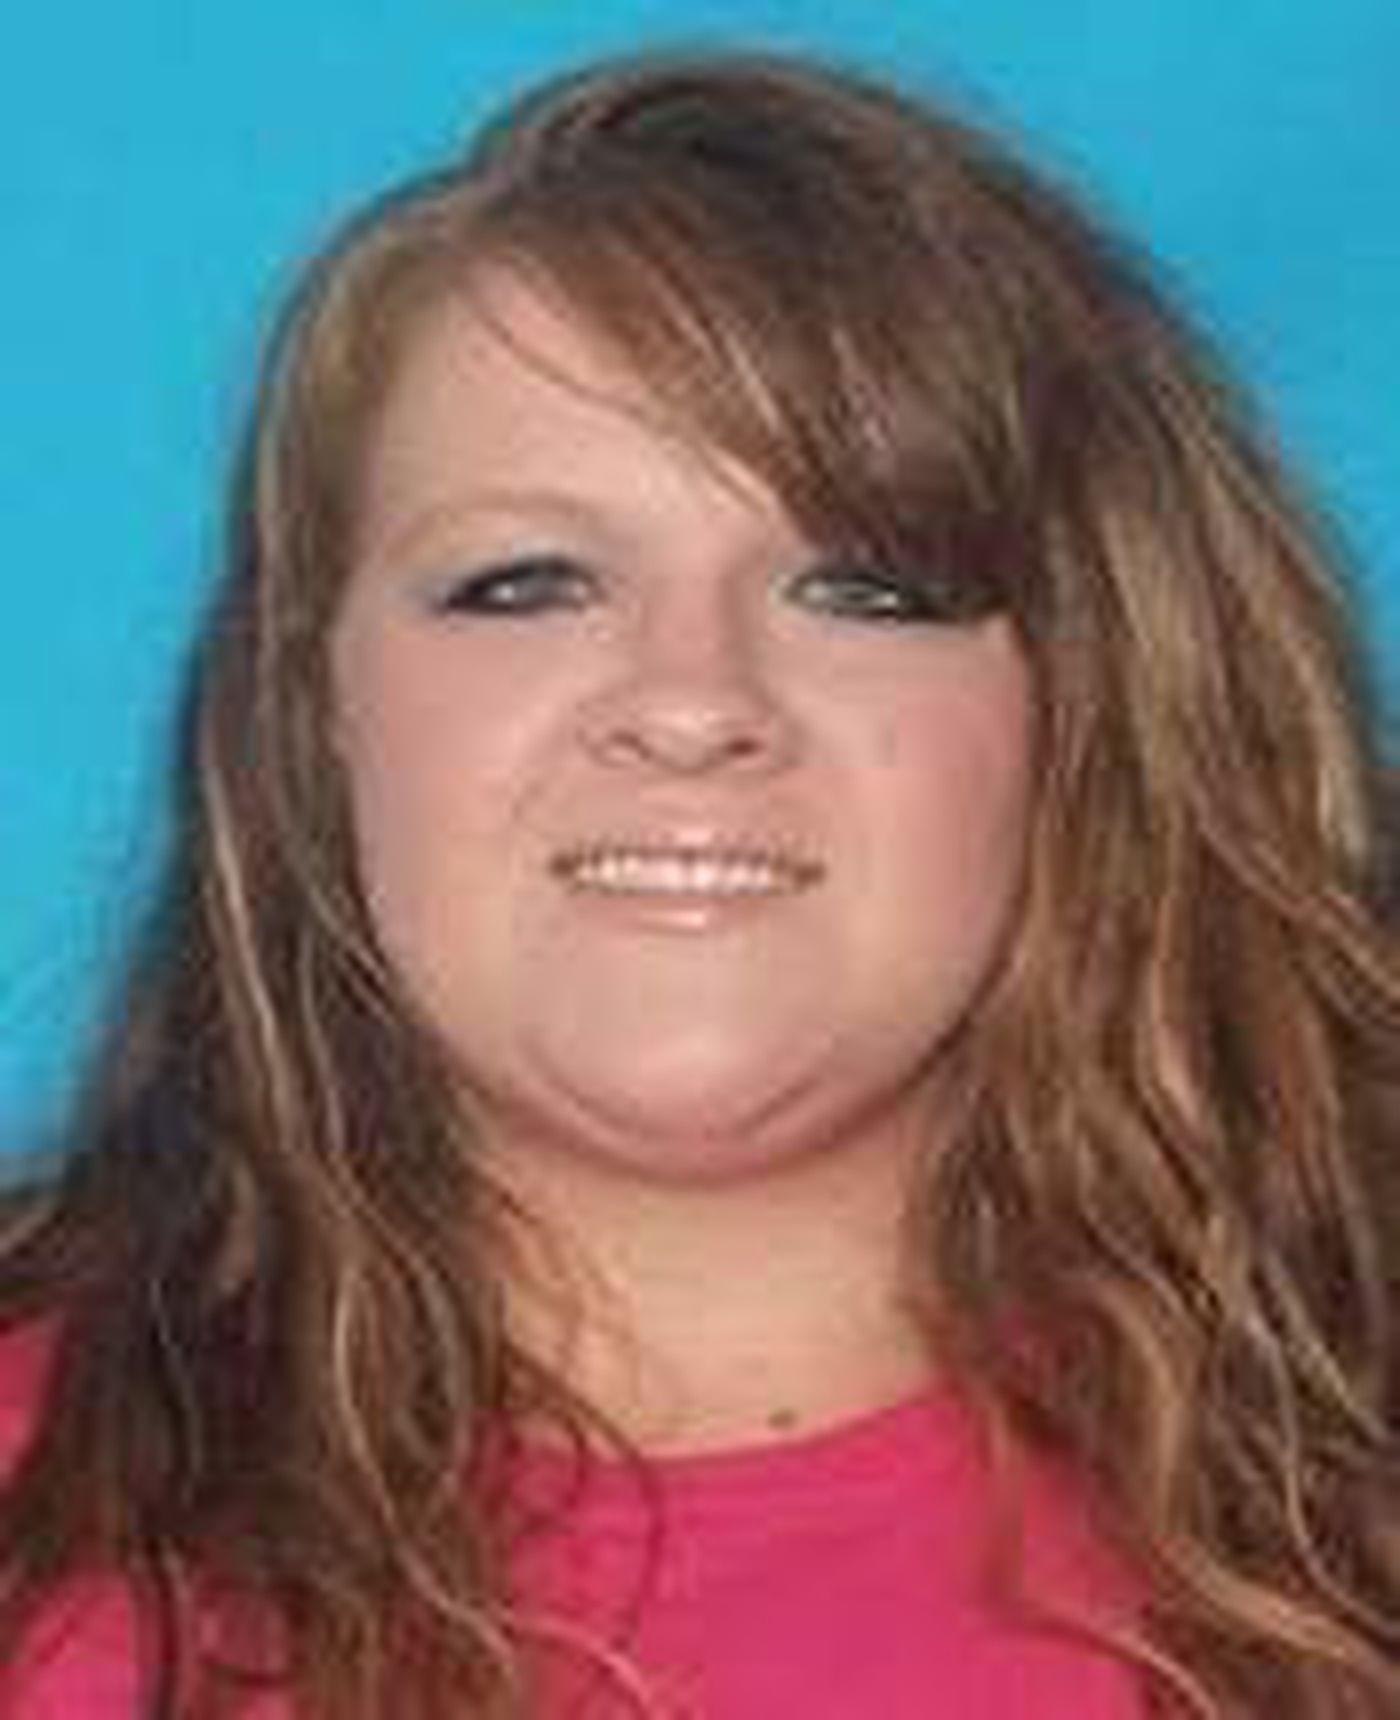 Mother, 2 children found dead in murder-suicide in Ripley Co